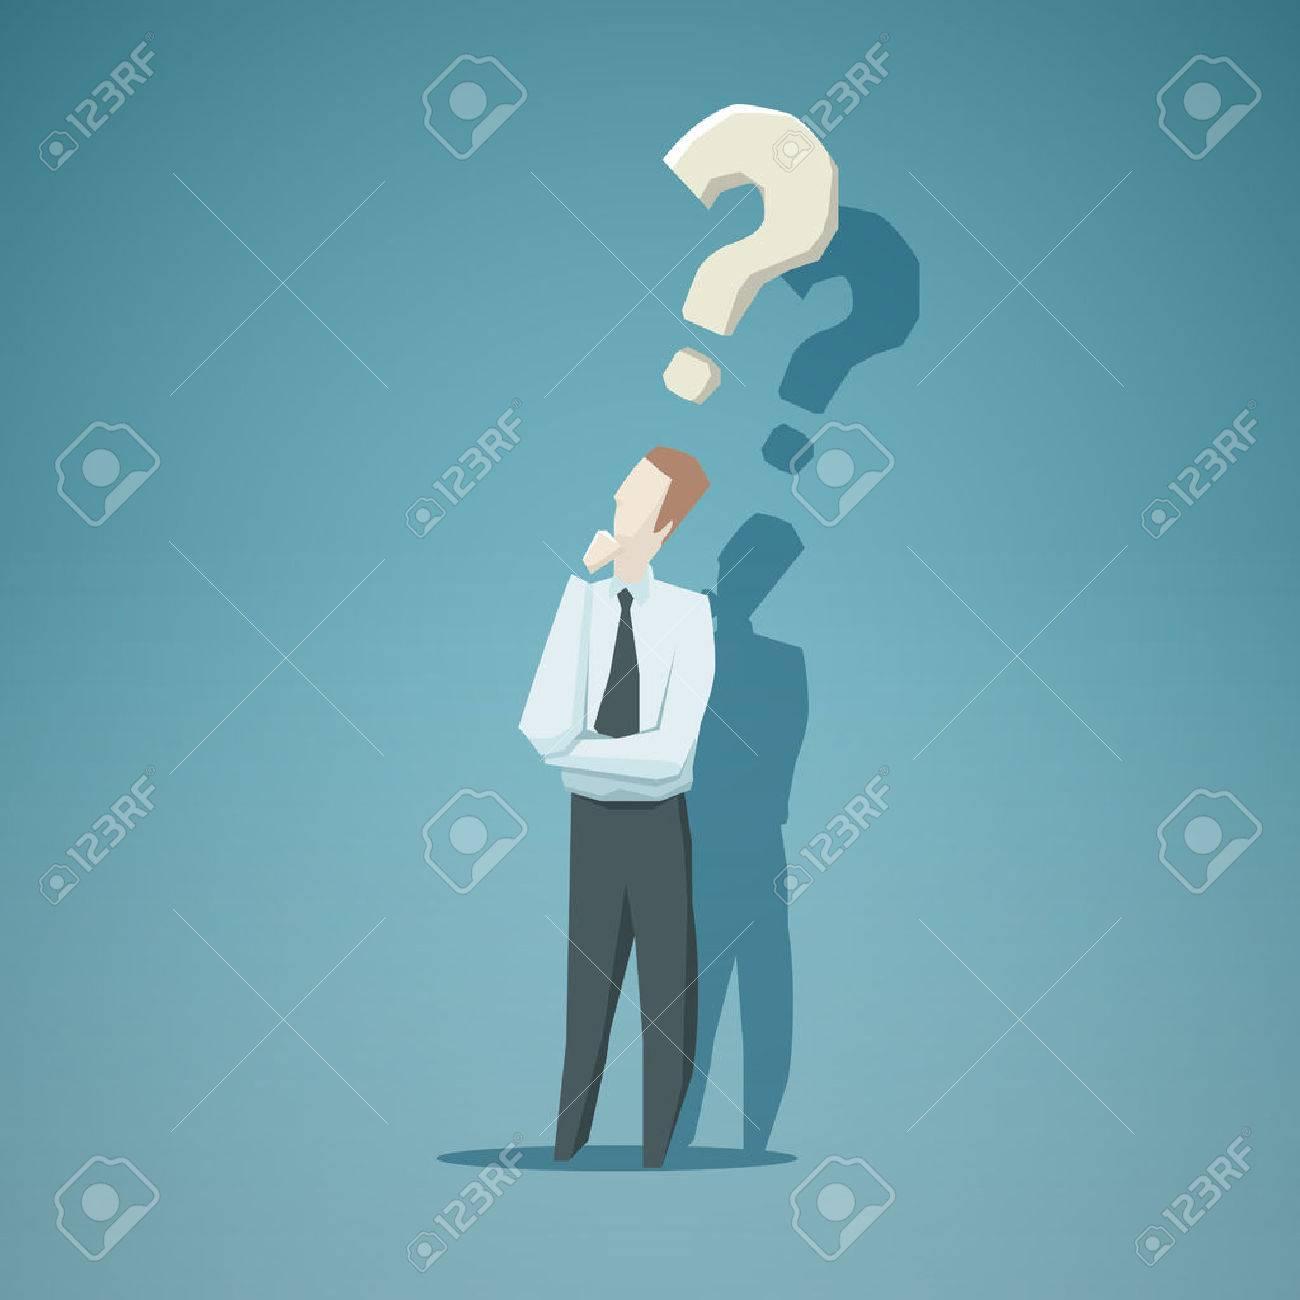 Dilemma of businessman. EPS 10 file - 40760929